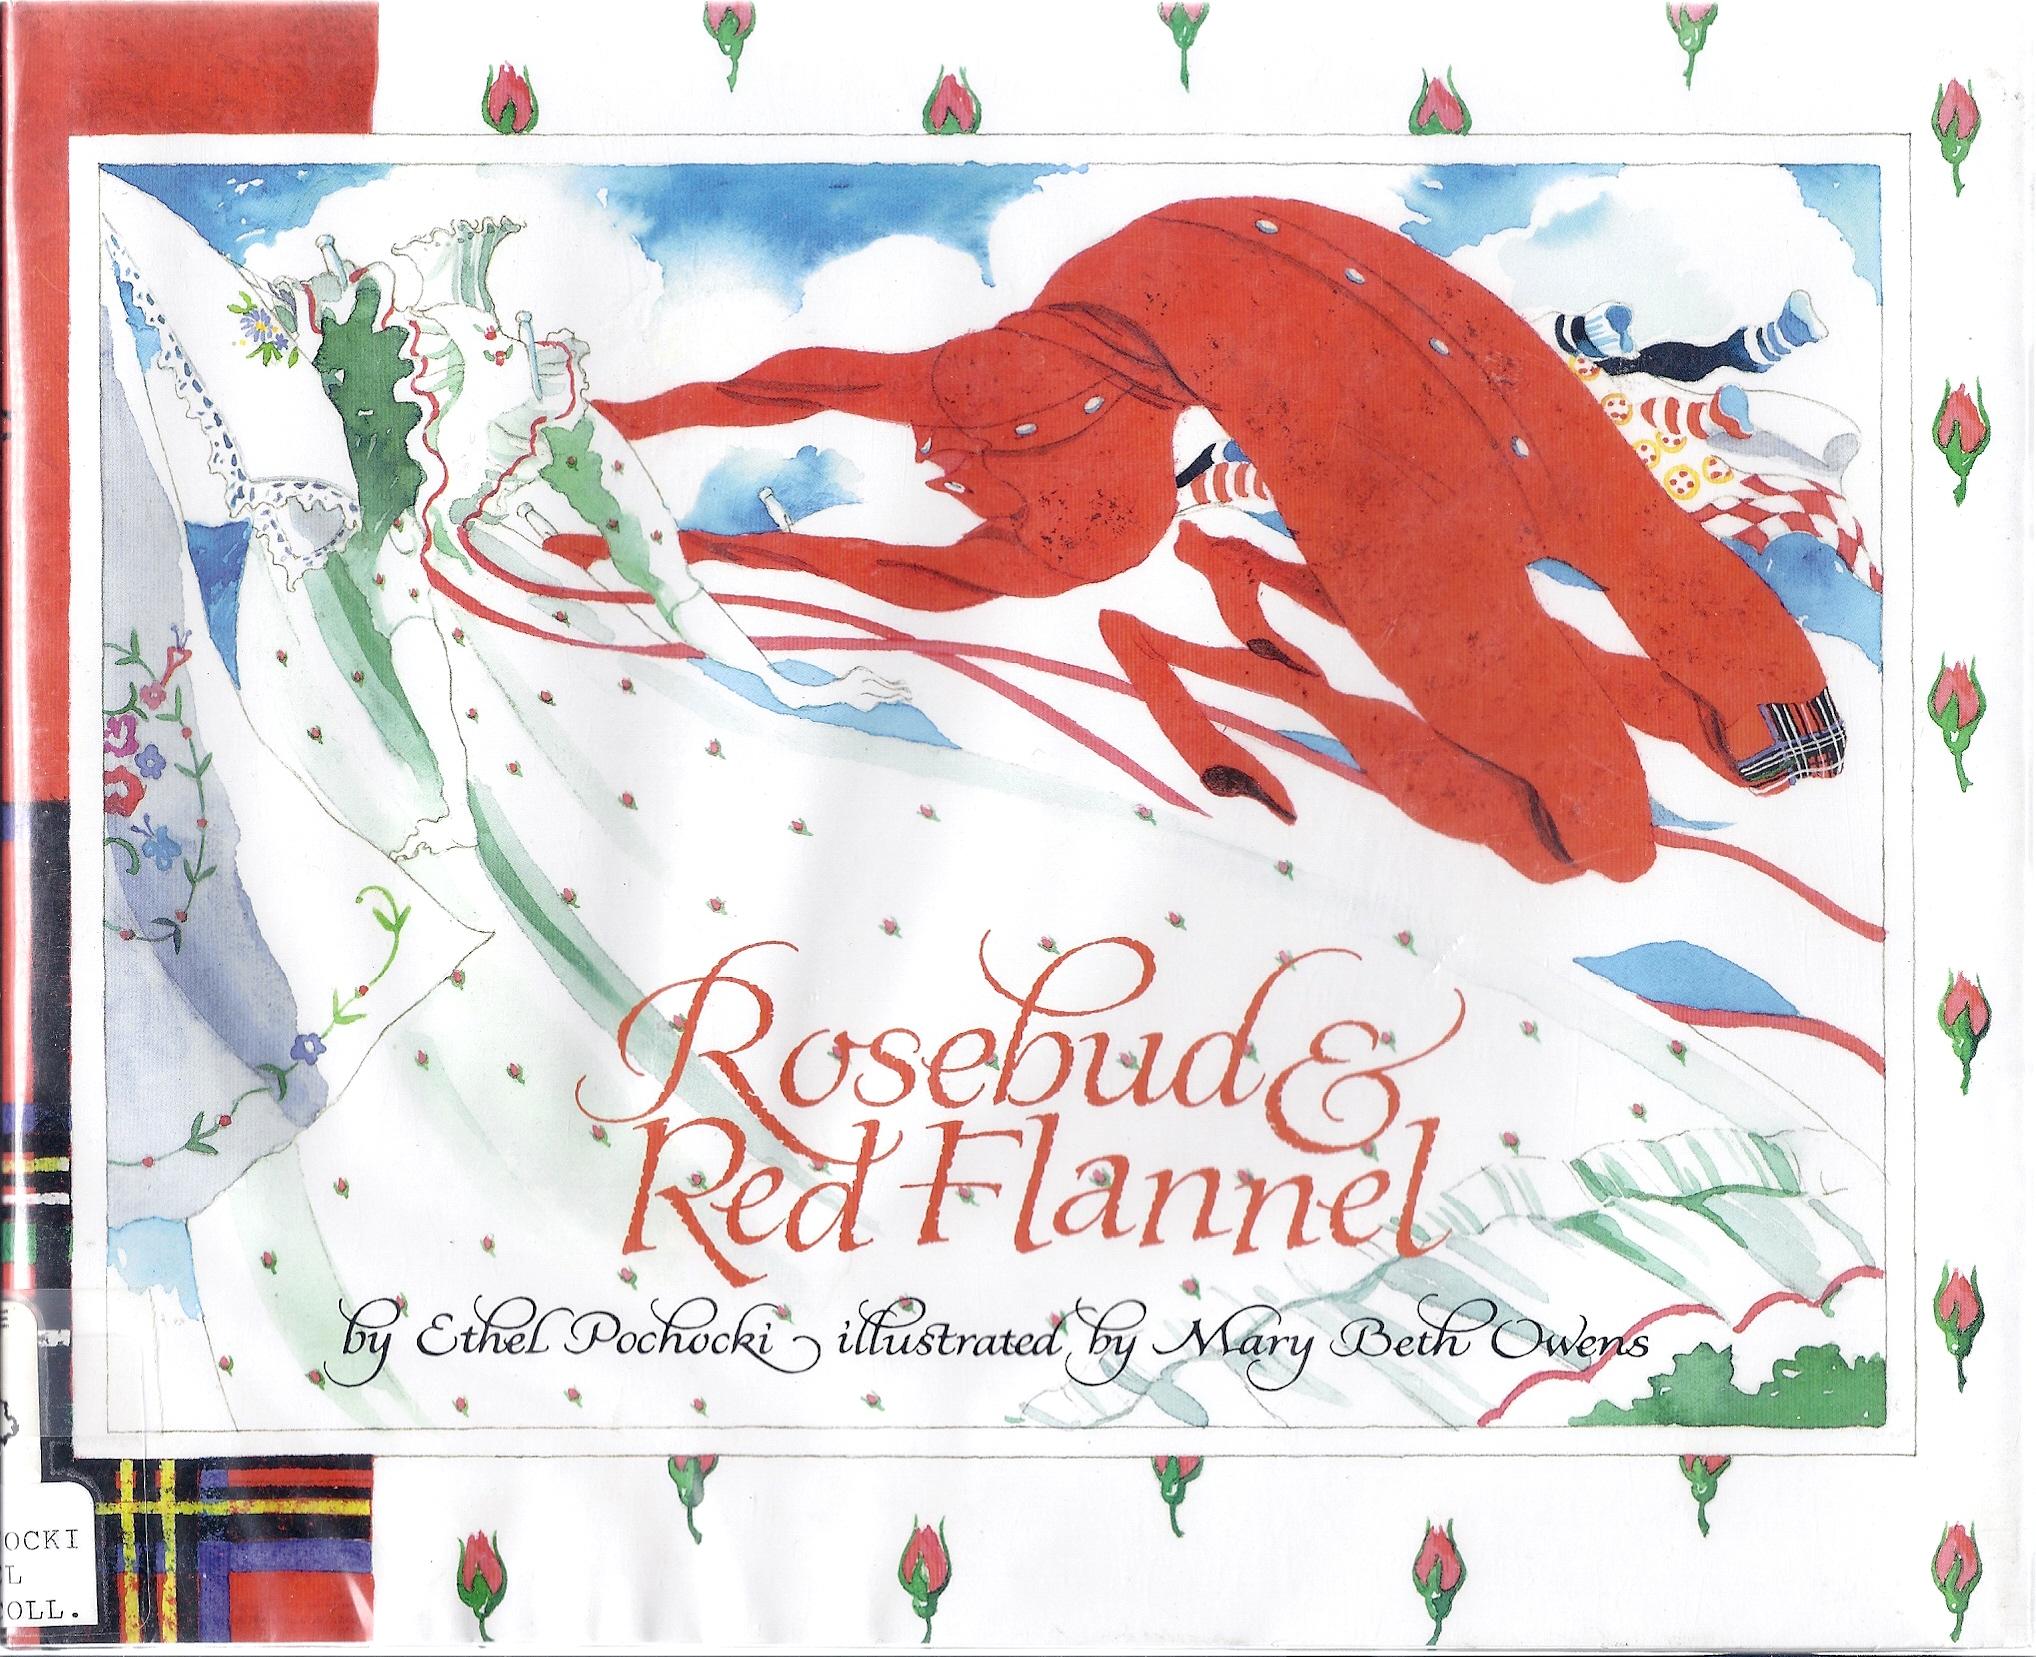 Rosebud & Red Flannel , written by Ethel Pochocki and illustrated by Mary Beth Owens